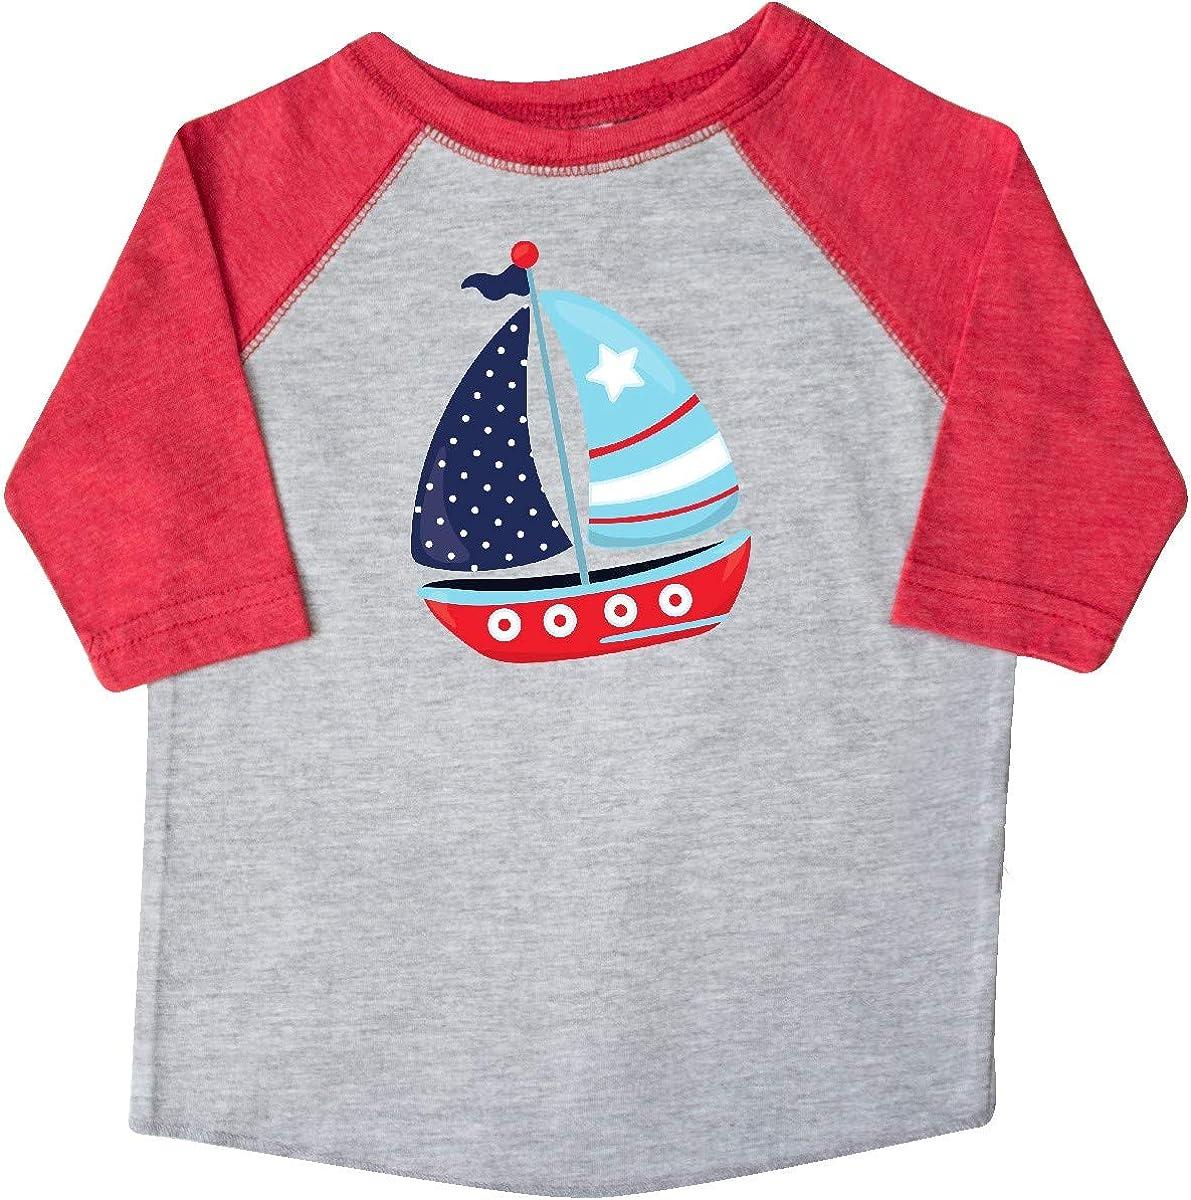 Sails Sailing Boat inktastic Sailboat Red Blue White Toddler T-Shirt